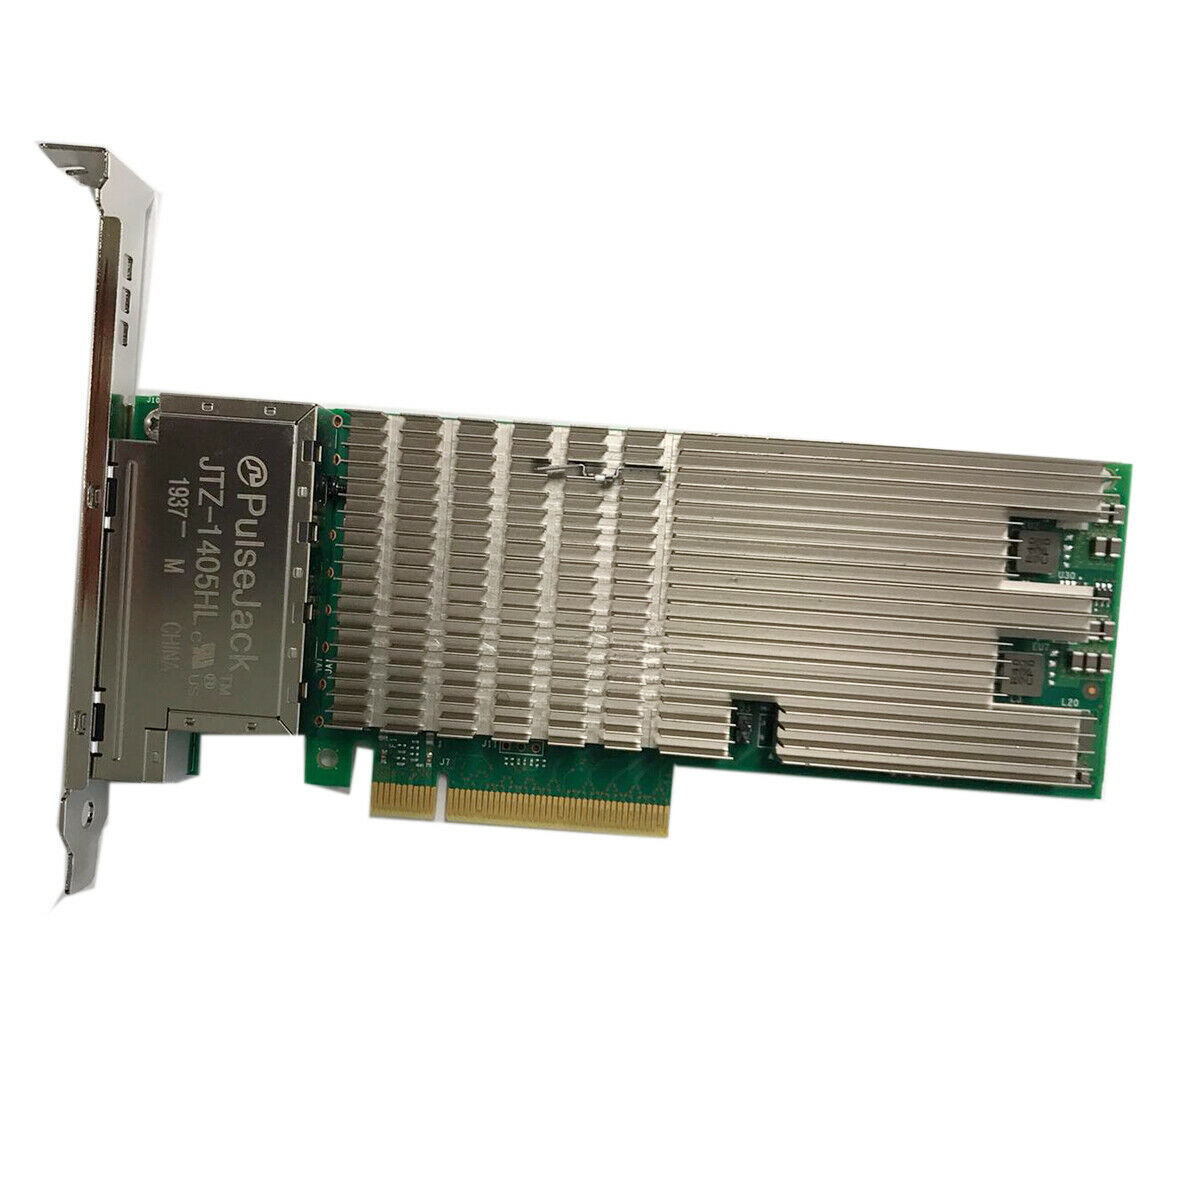 DELL QL41262HLCU-DE QLOGIC 10GBE Four PORT SFP28 Server Adapter Ethernet Network